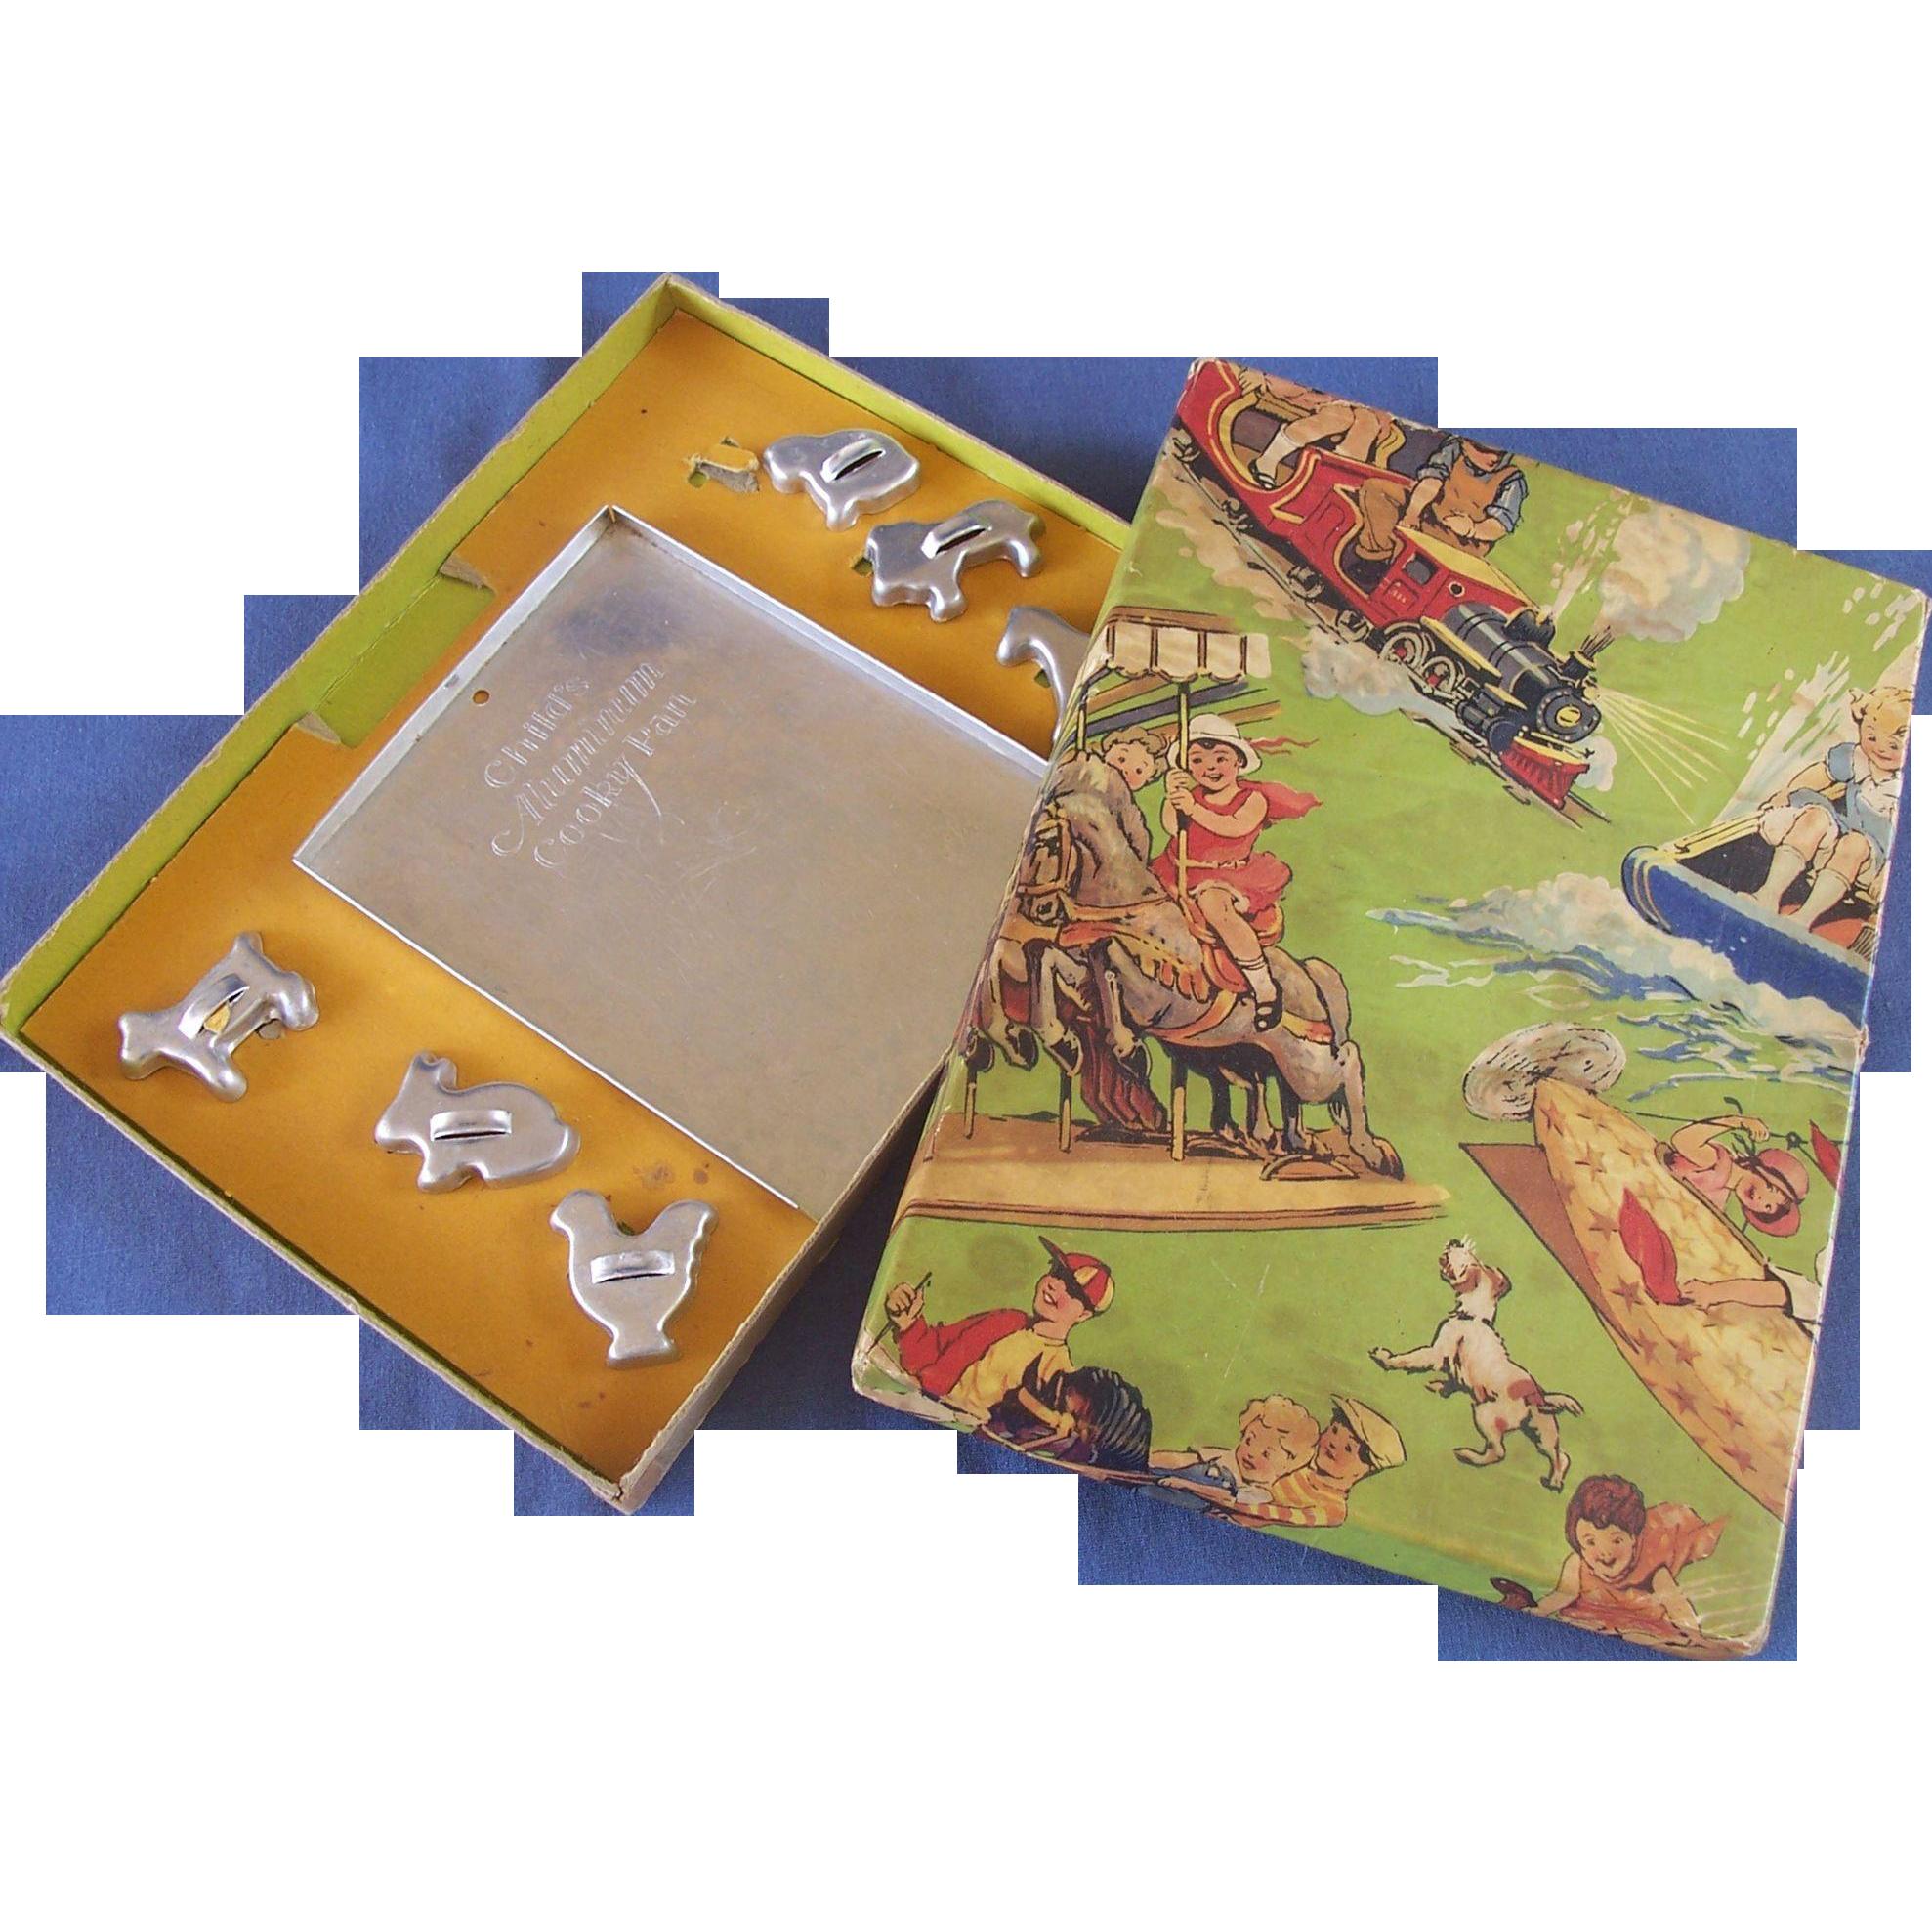 Child's Cookie Cutter Set in the Original Box